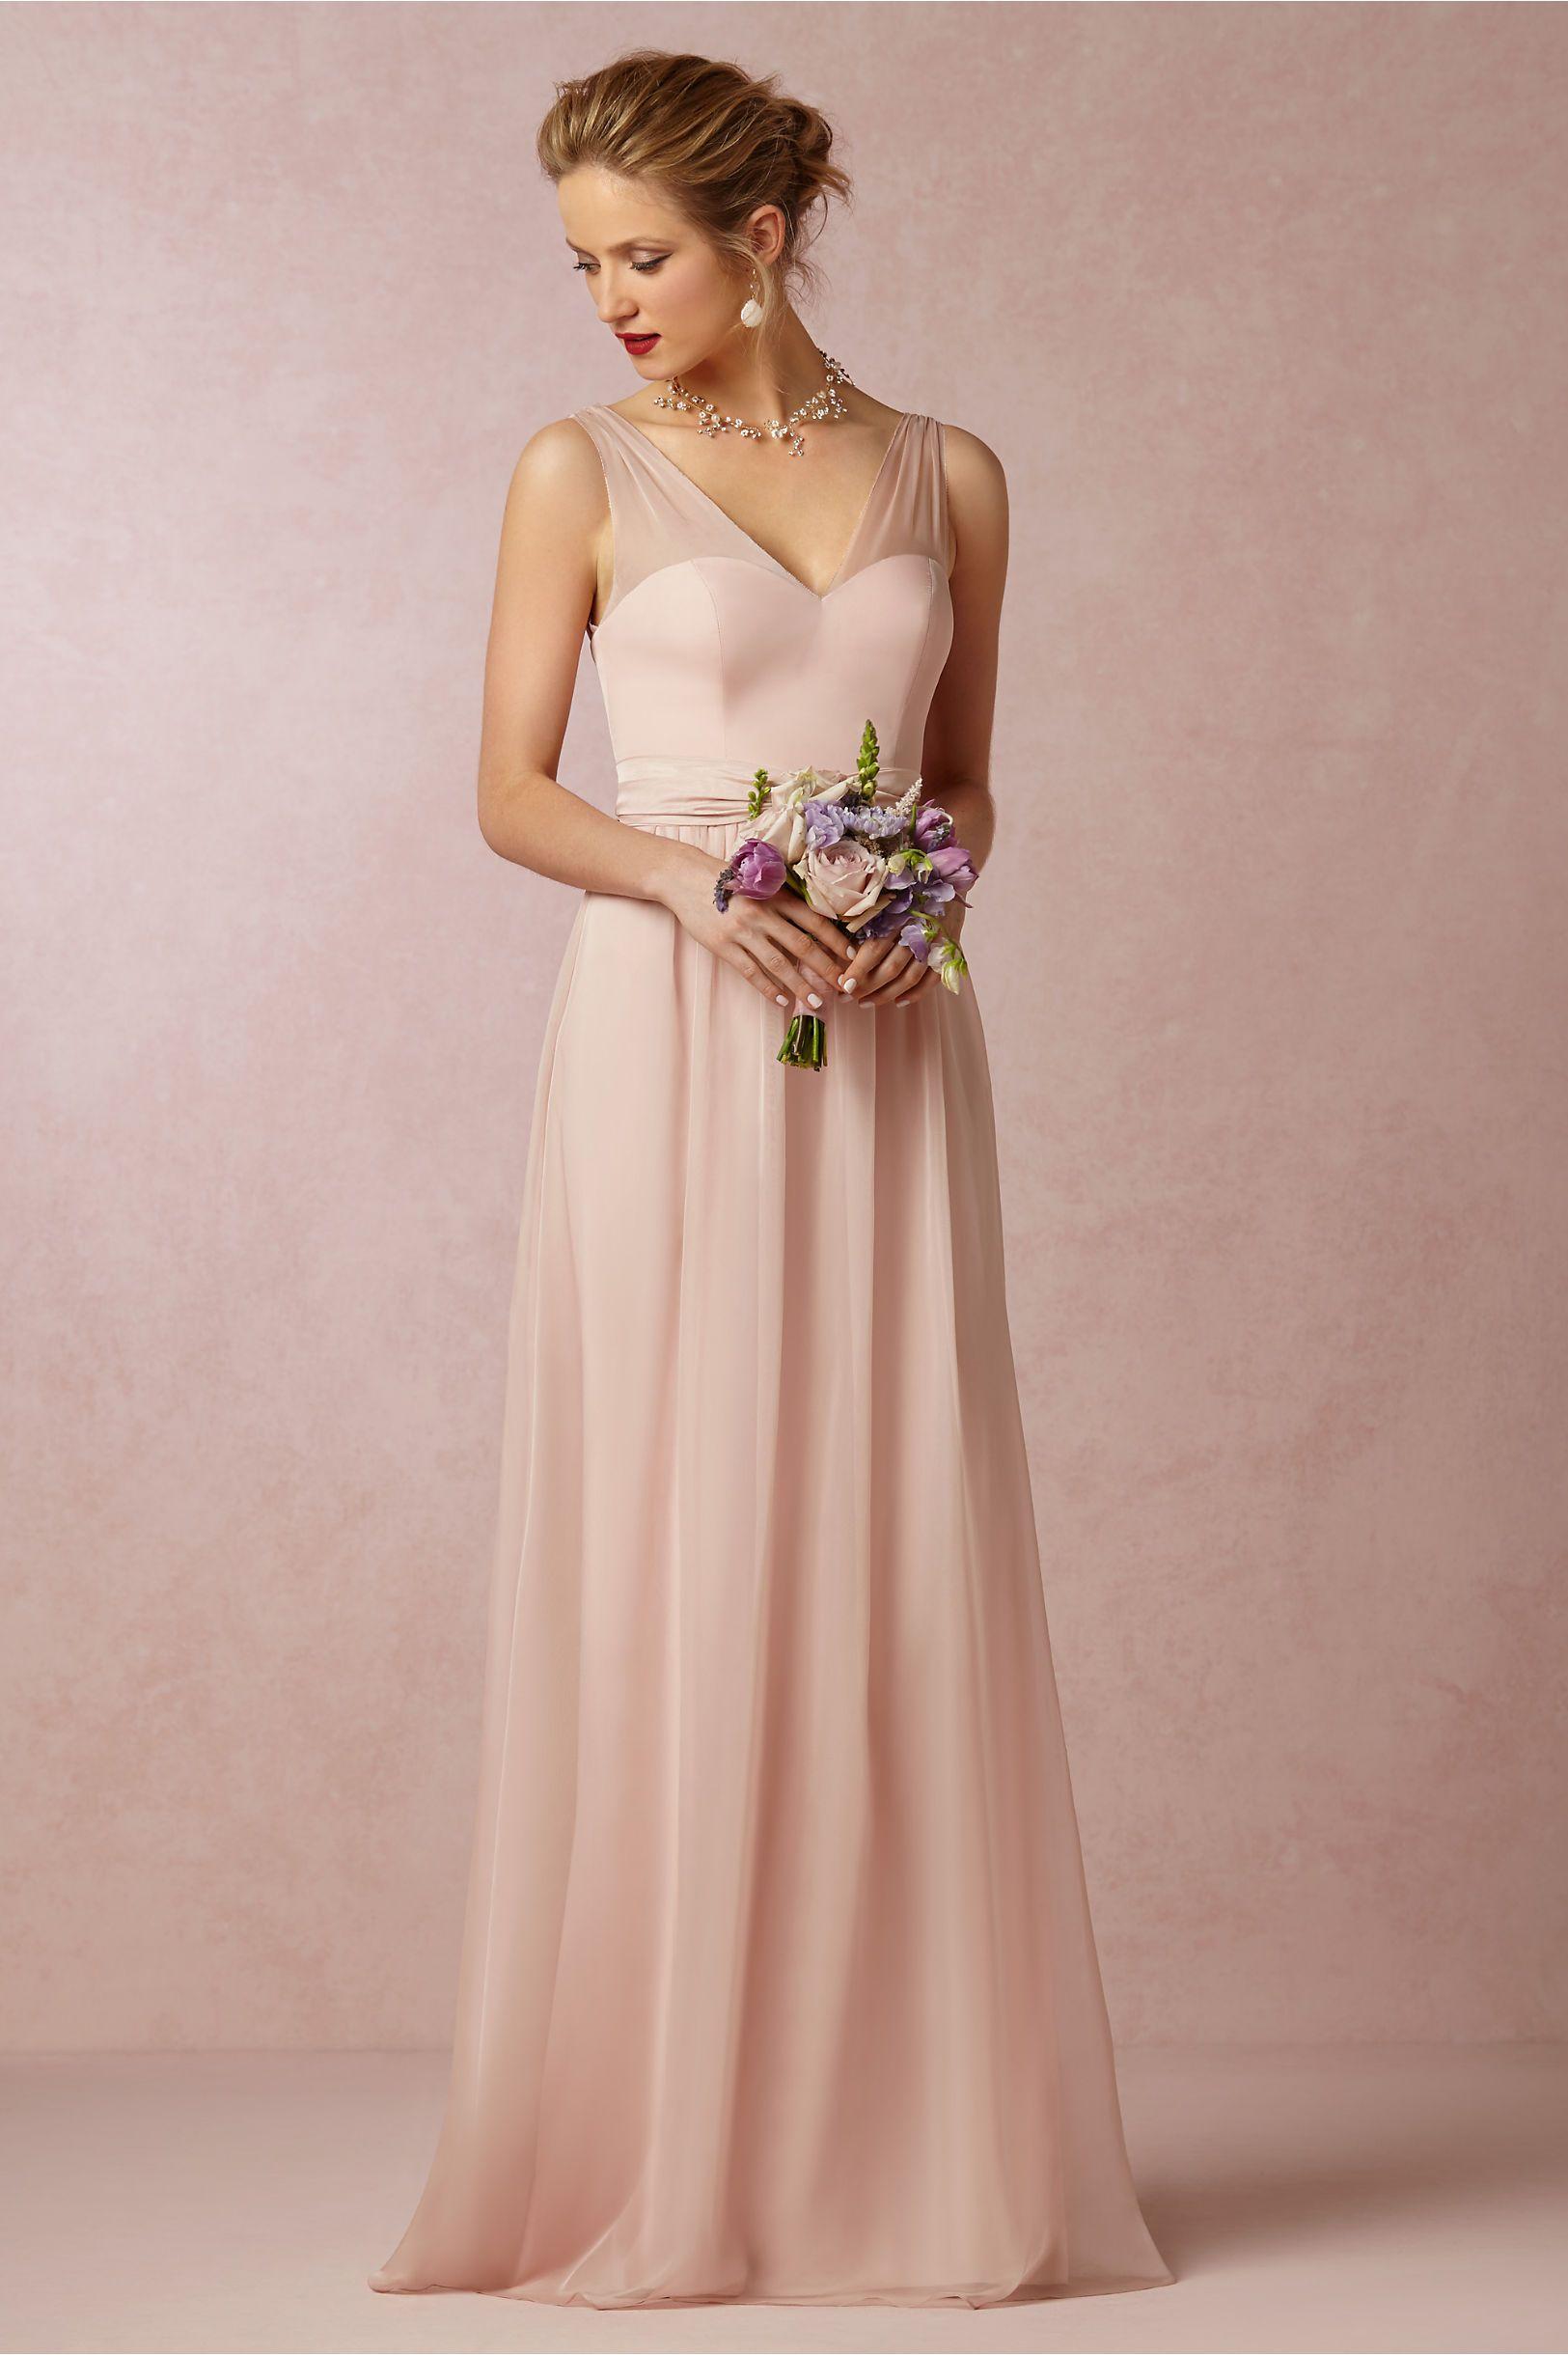 Josephine Dress Bridesmaid Dresses Uk Bridesmaid Dresses Long Chiffon Blush Pink Bridesmaid Dresses